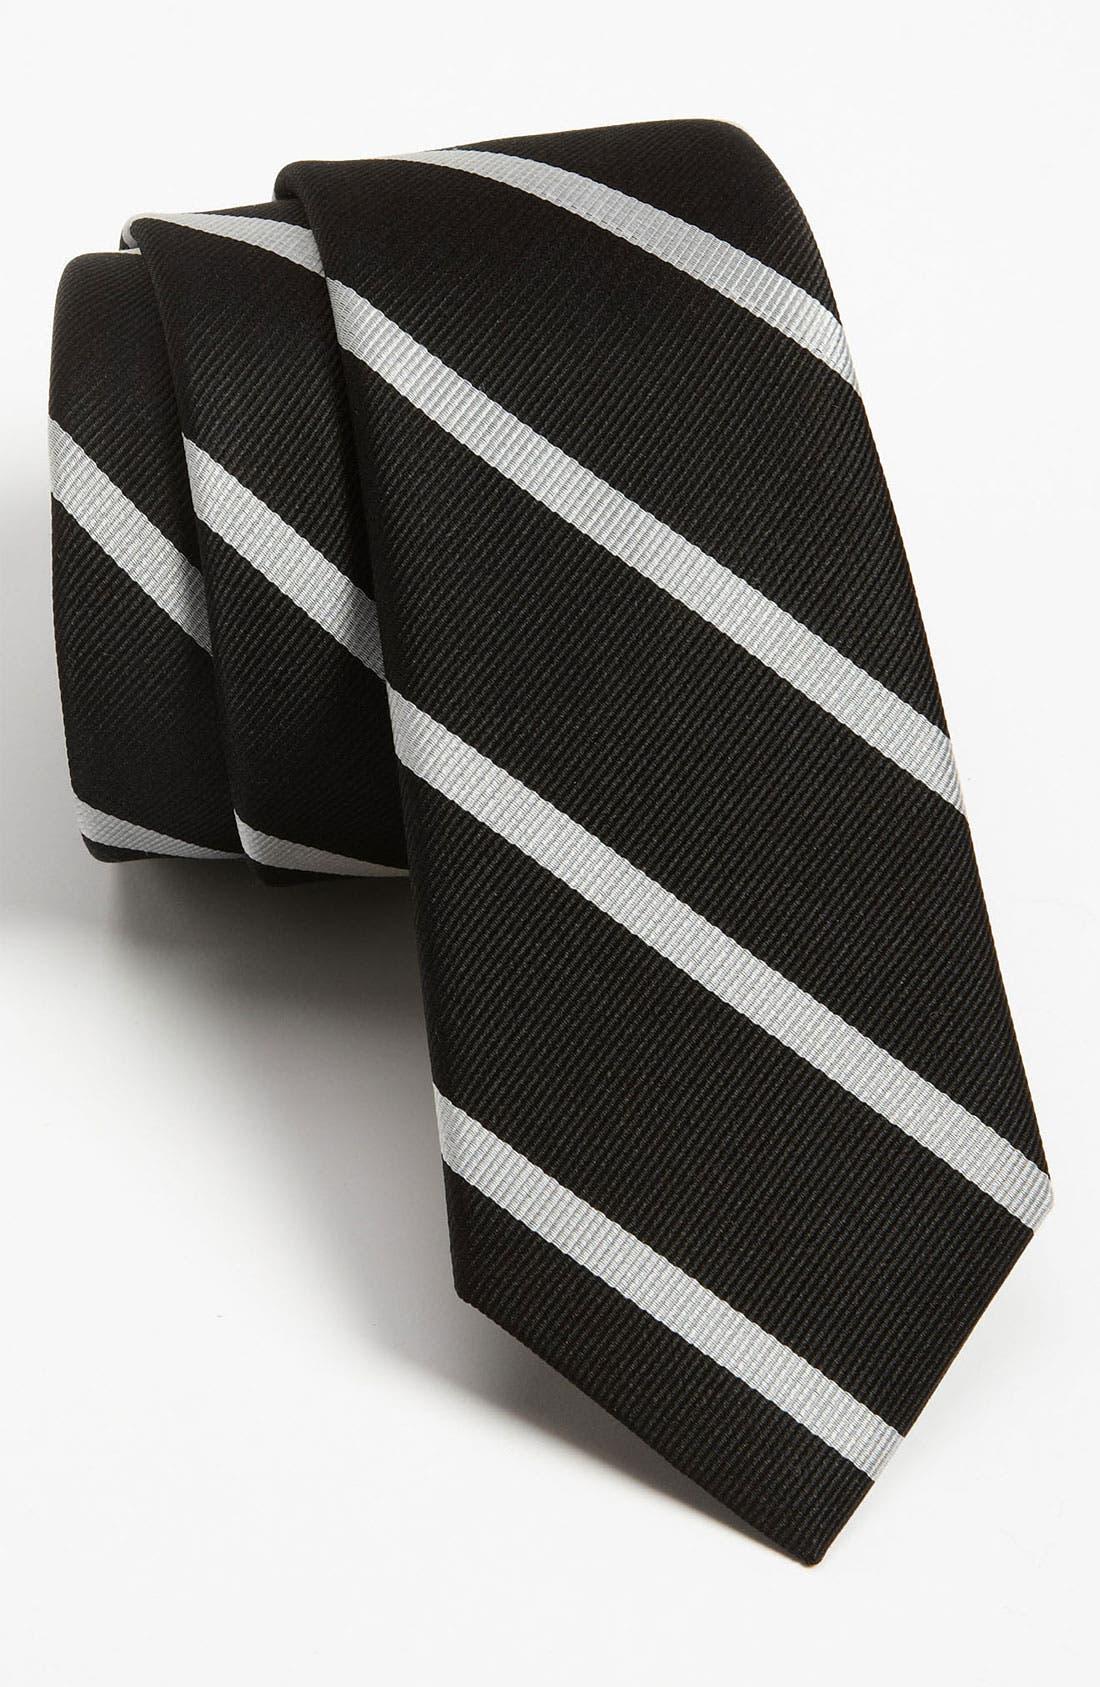 Alternate Image 1 Selected - The Tie Bar Woven Silk Tie (Online Exclusive)